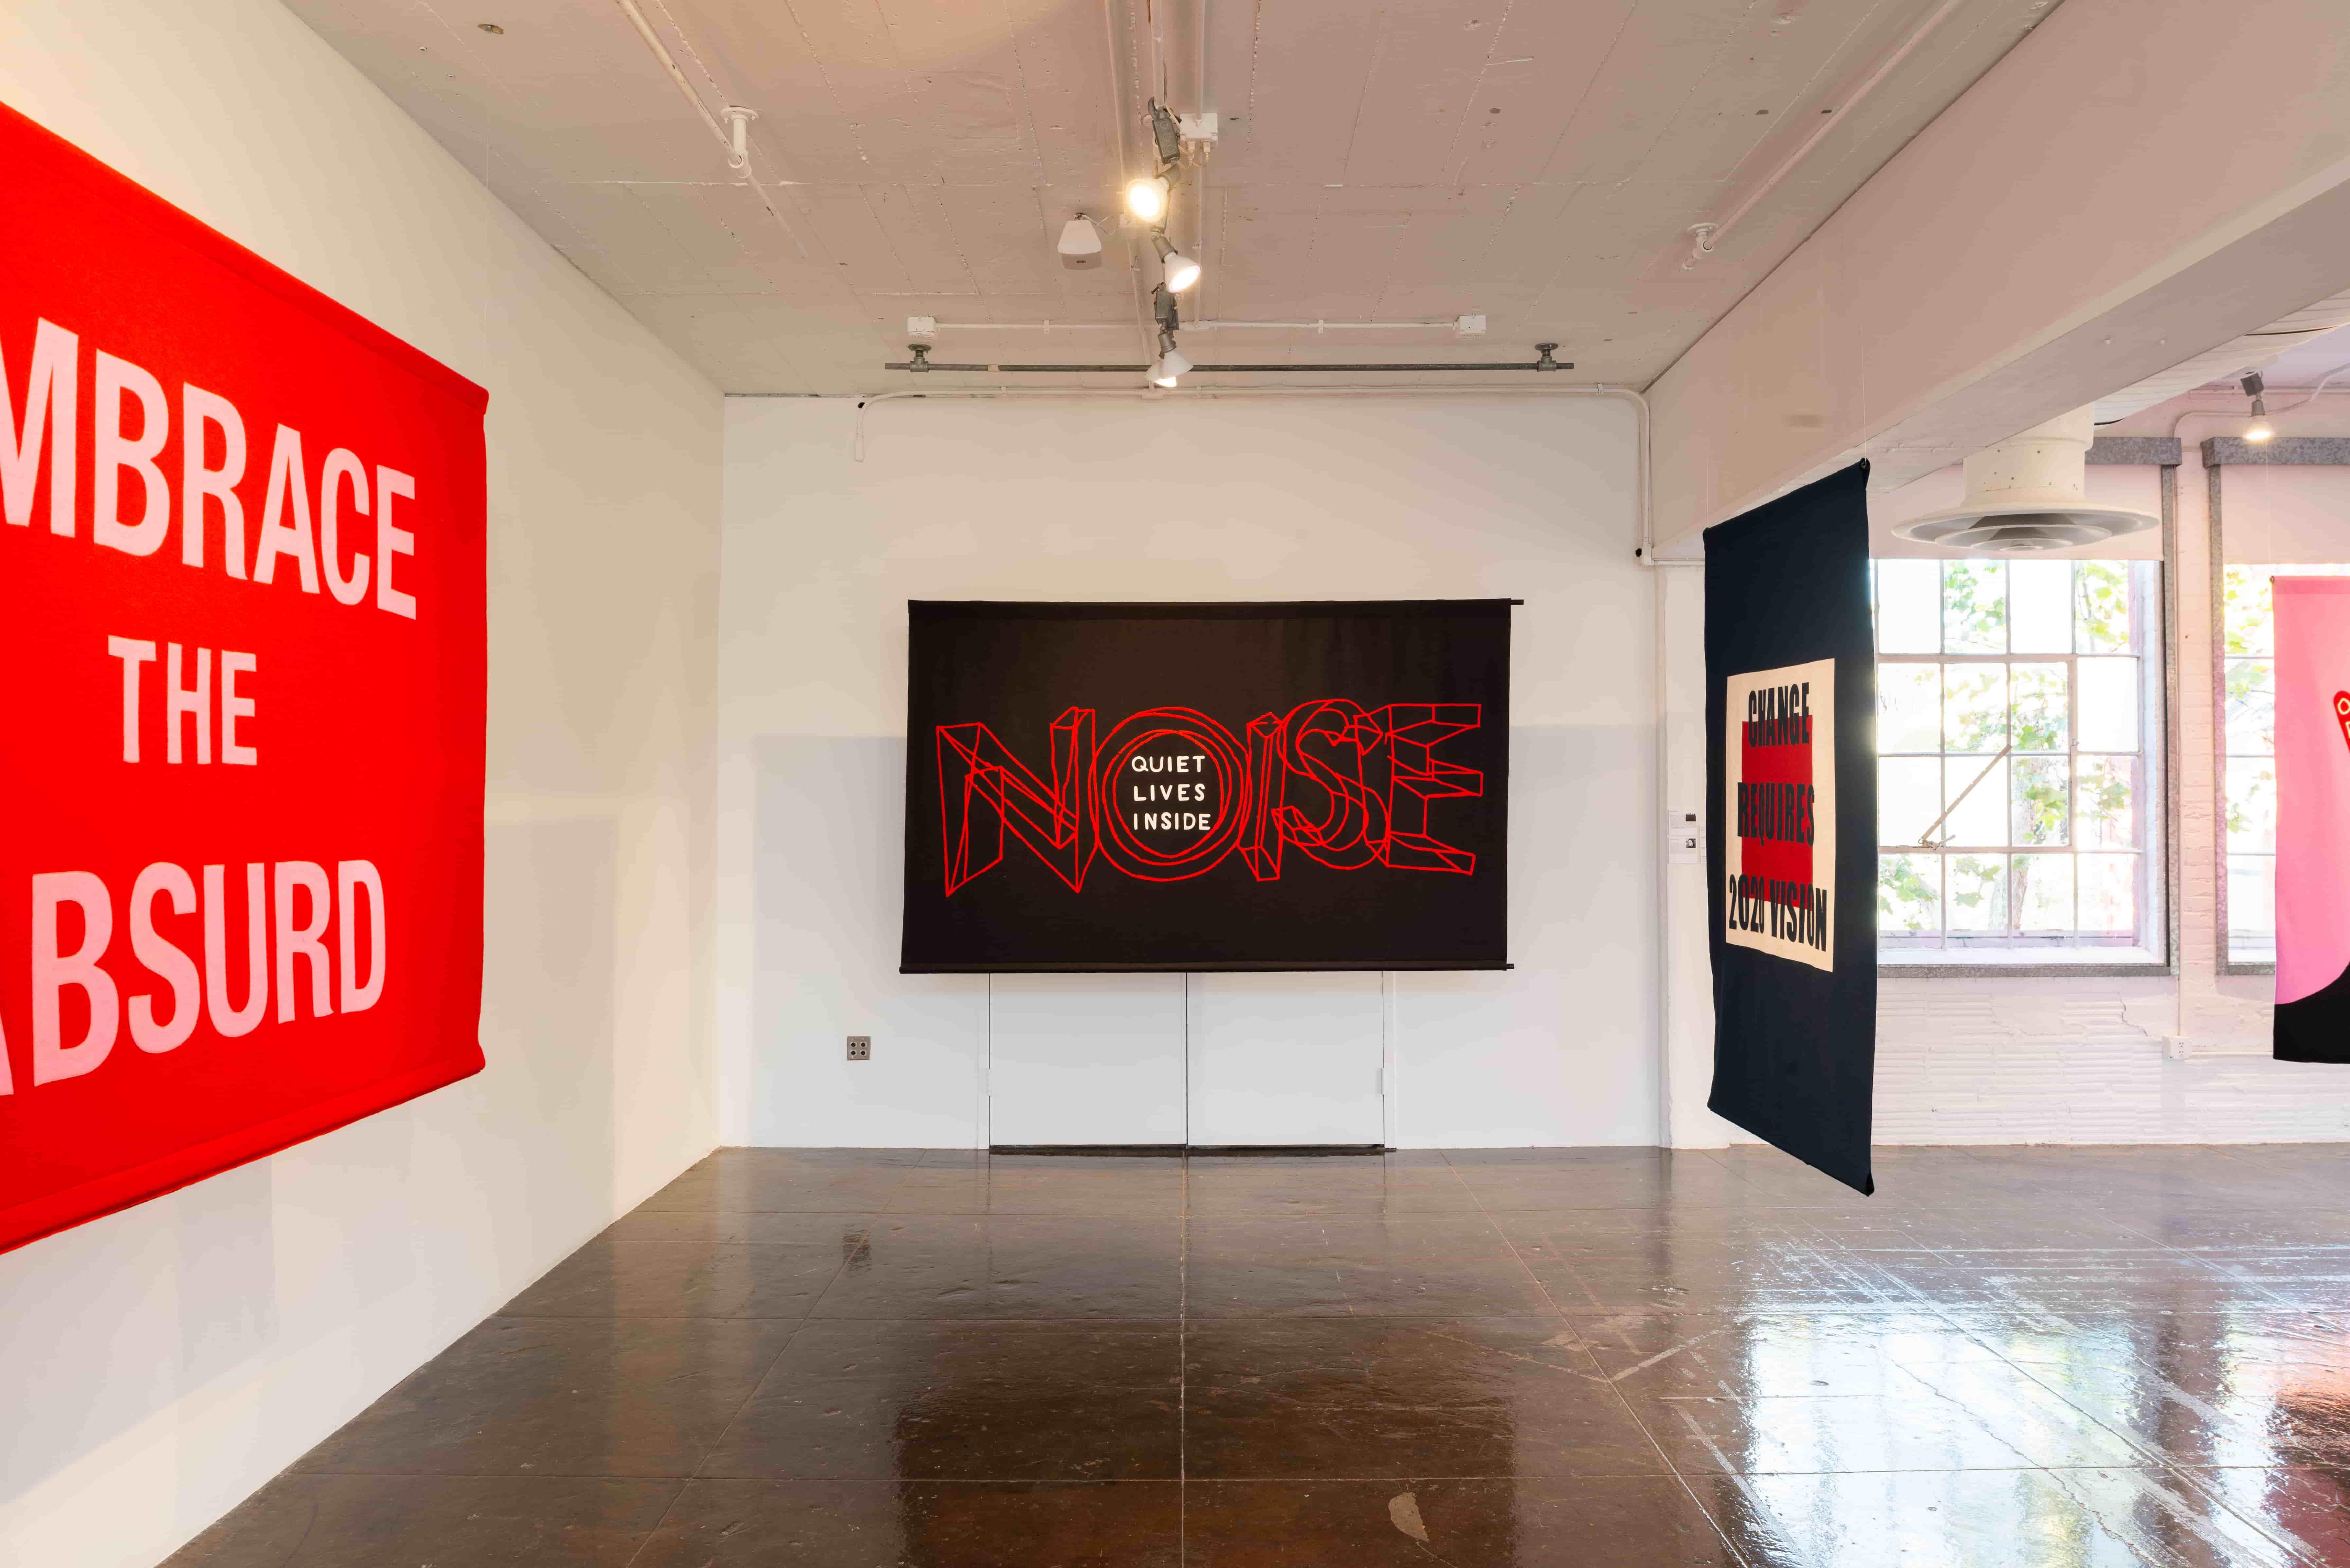 Naomi Shihab Nye/House of Trees, Noise quiet lives inside (2018). Felt banner.Image courtesy of Artpace